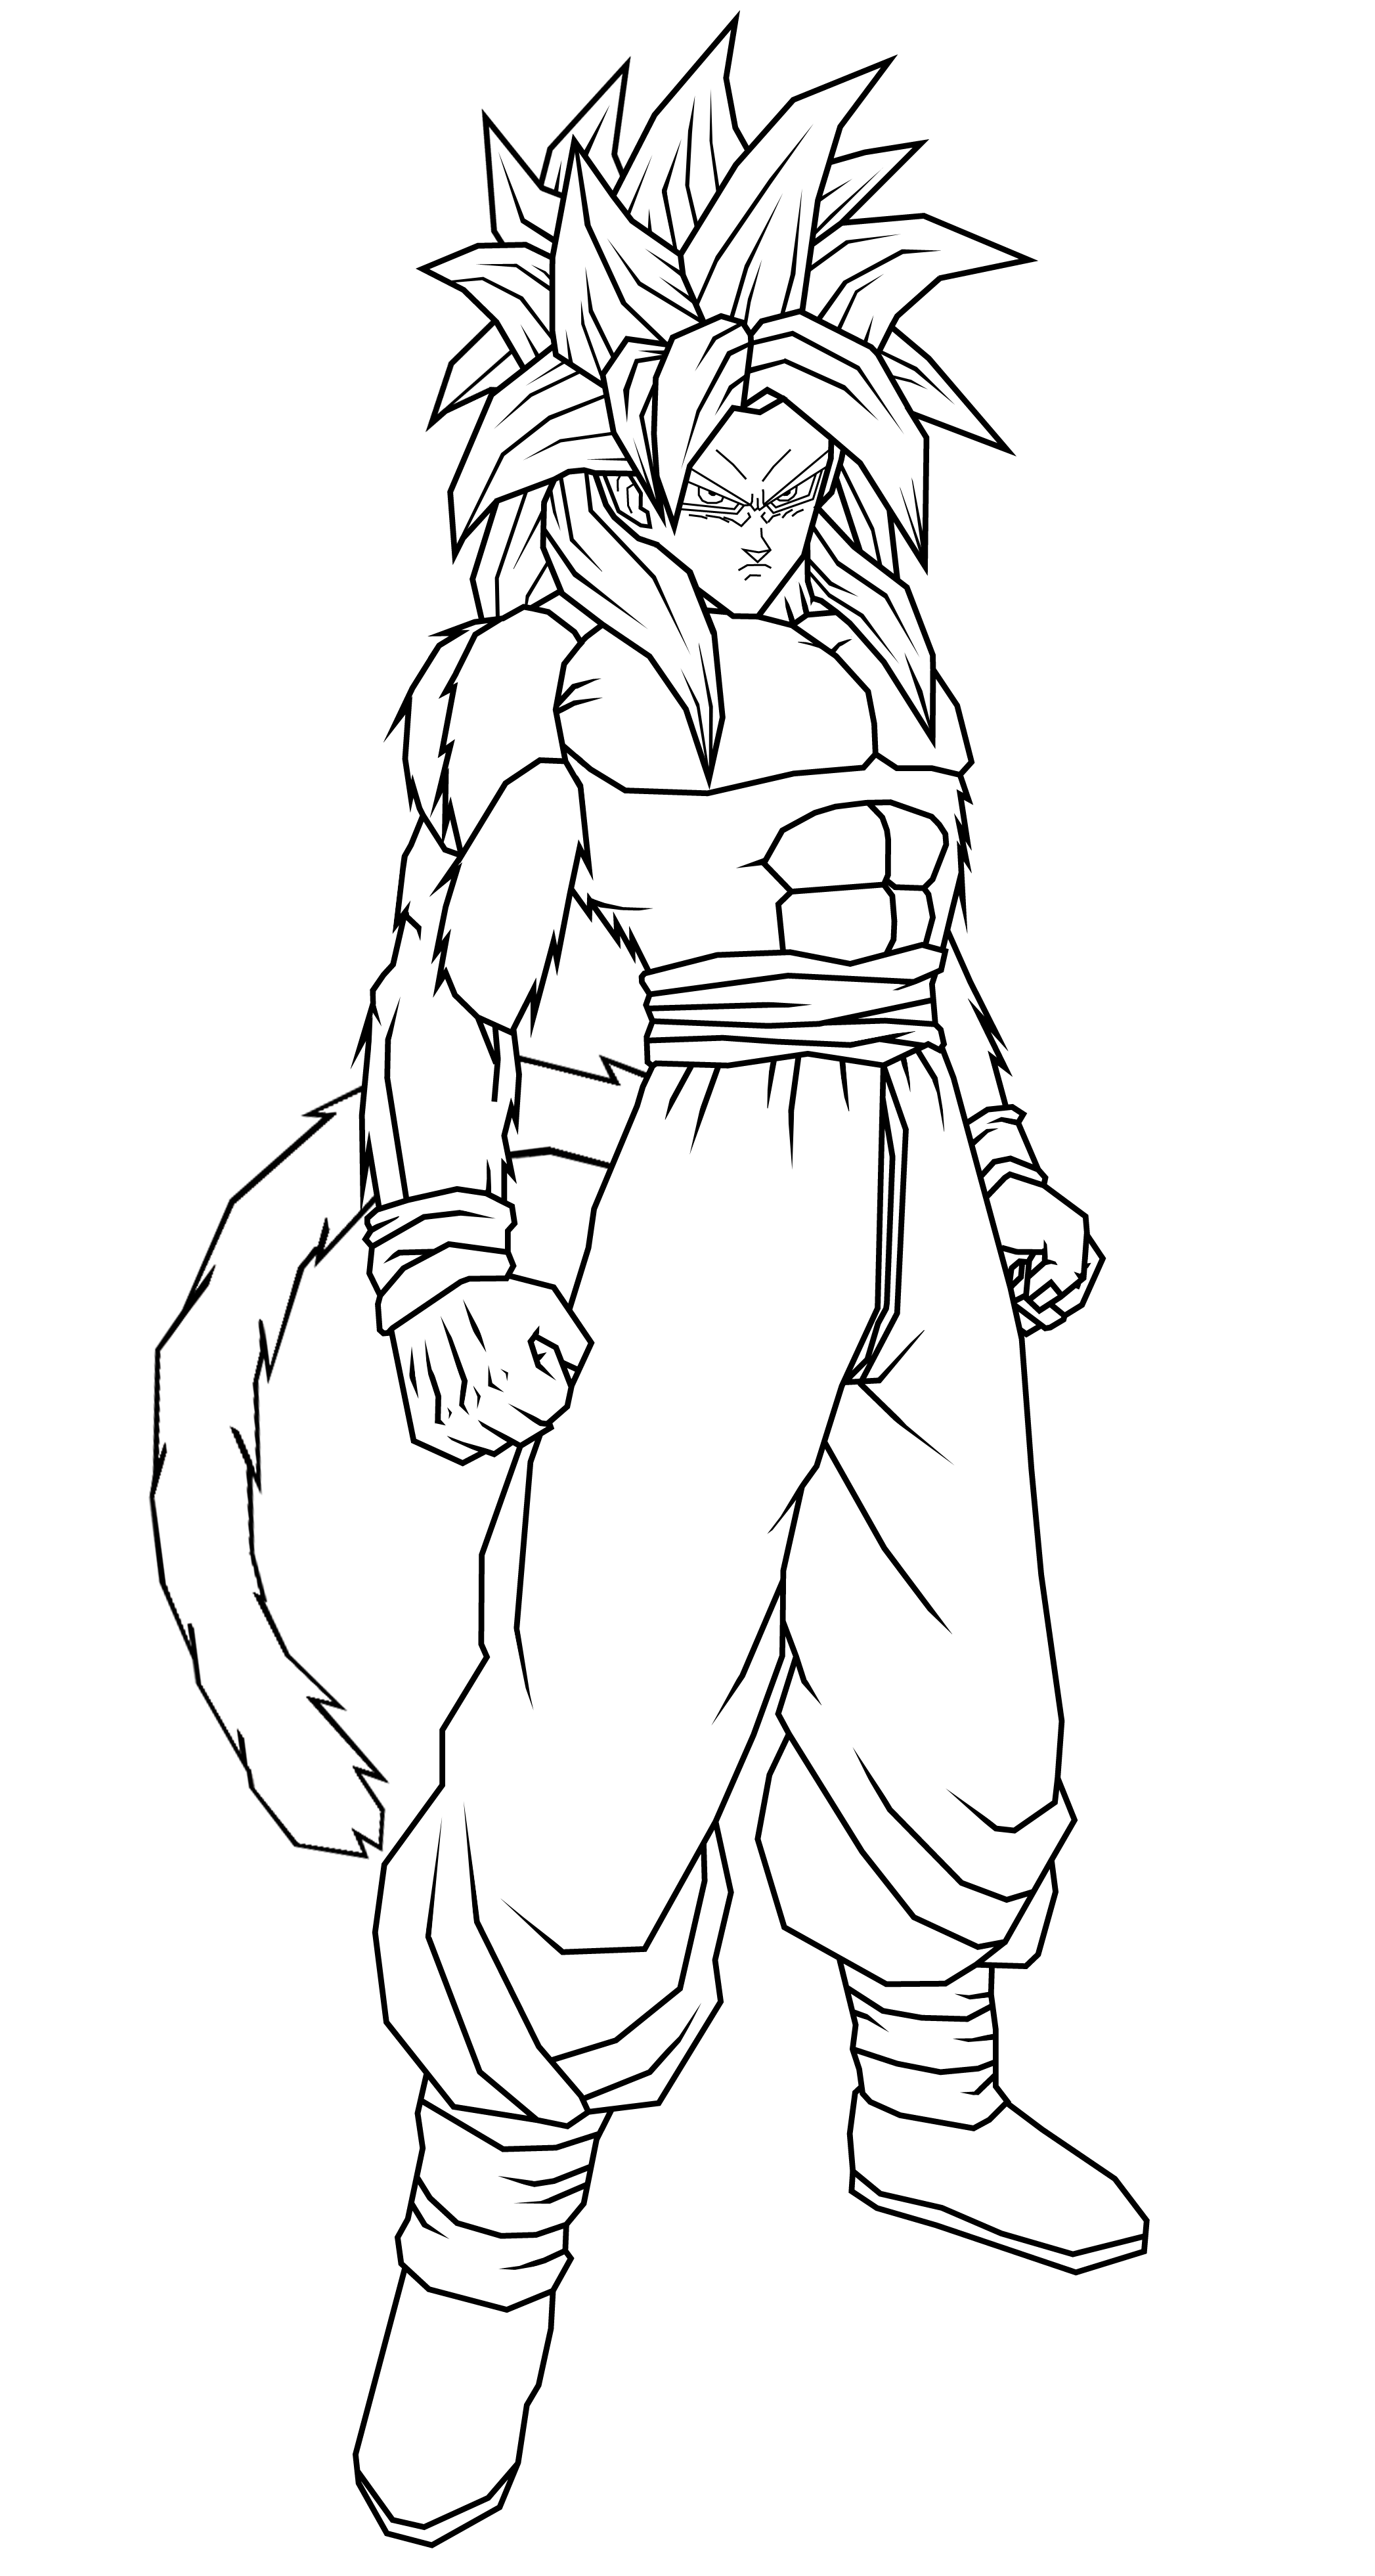 Goku GT SSJ4 Lineart by theothersmen on DeviantArt